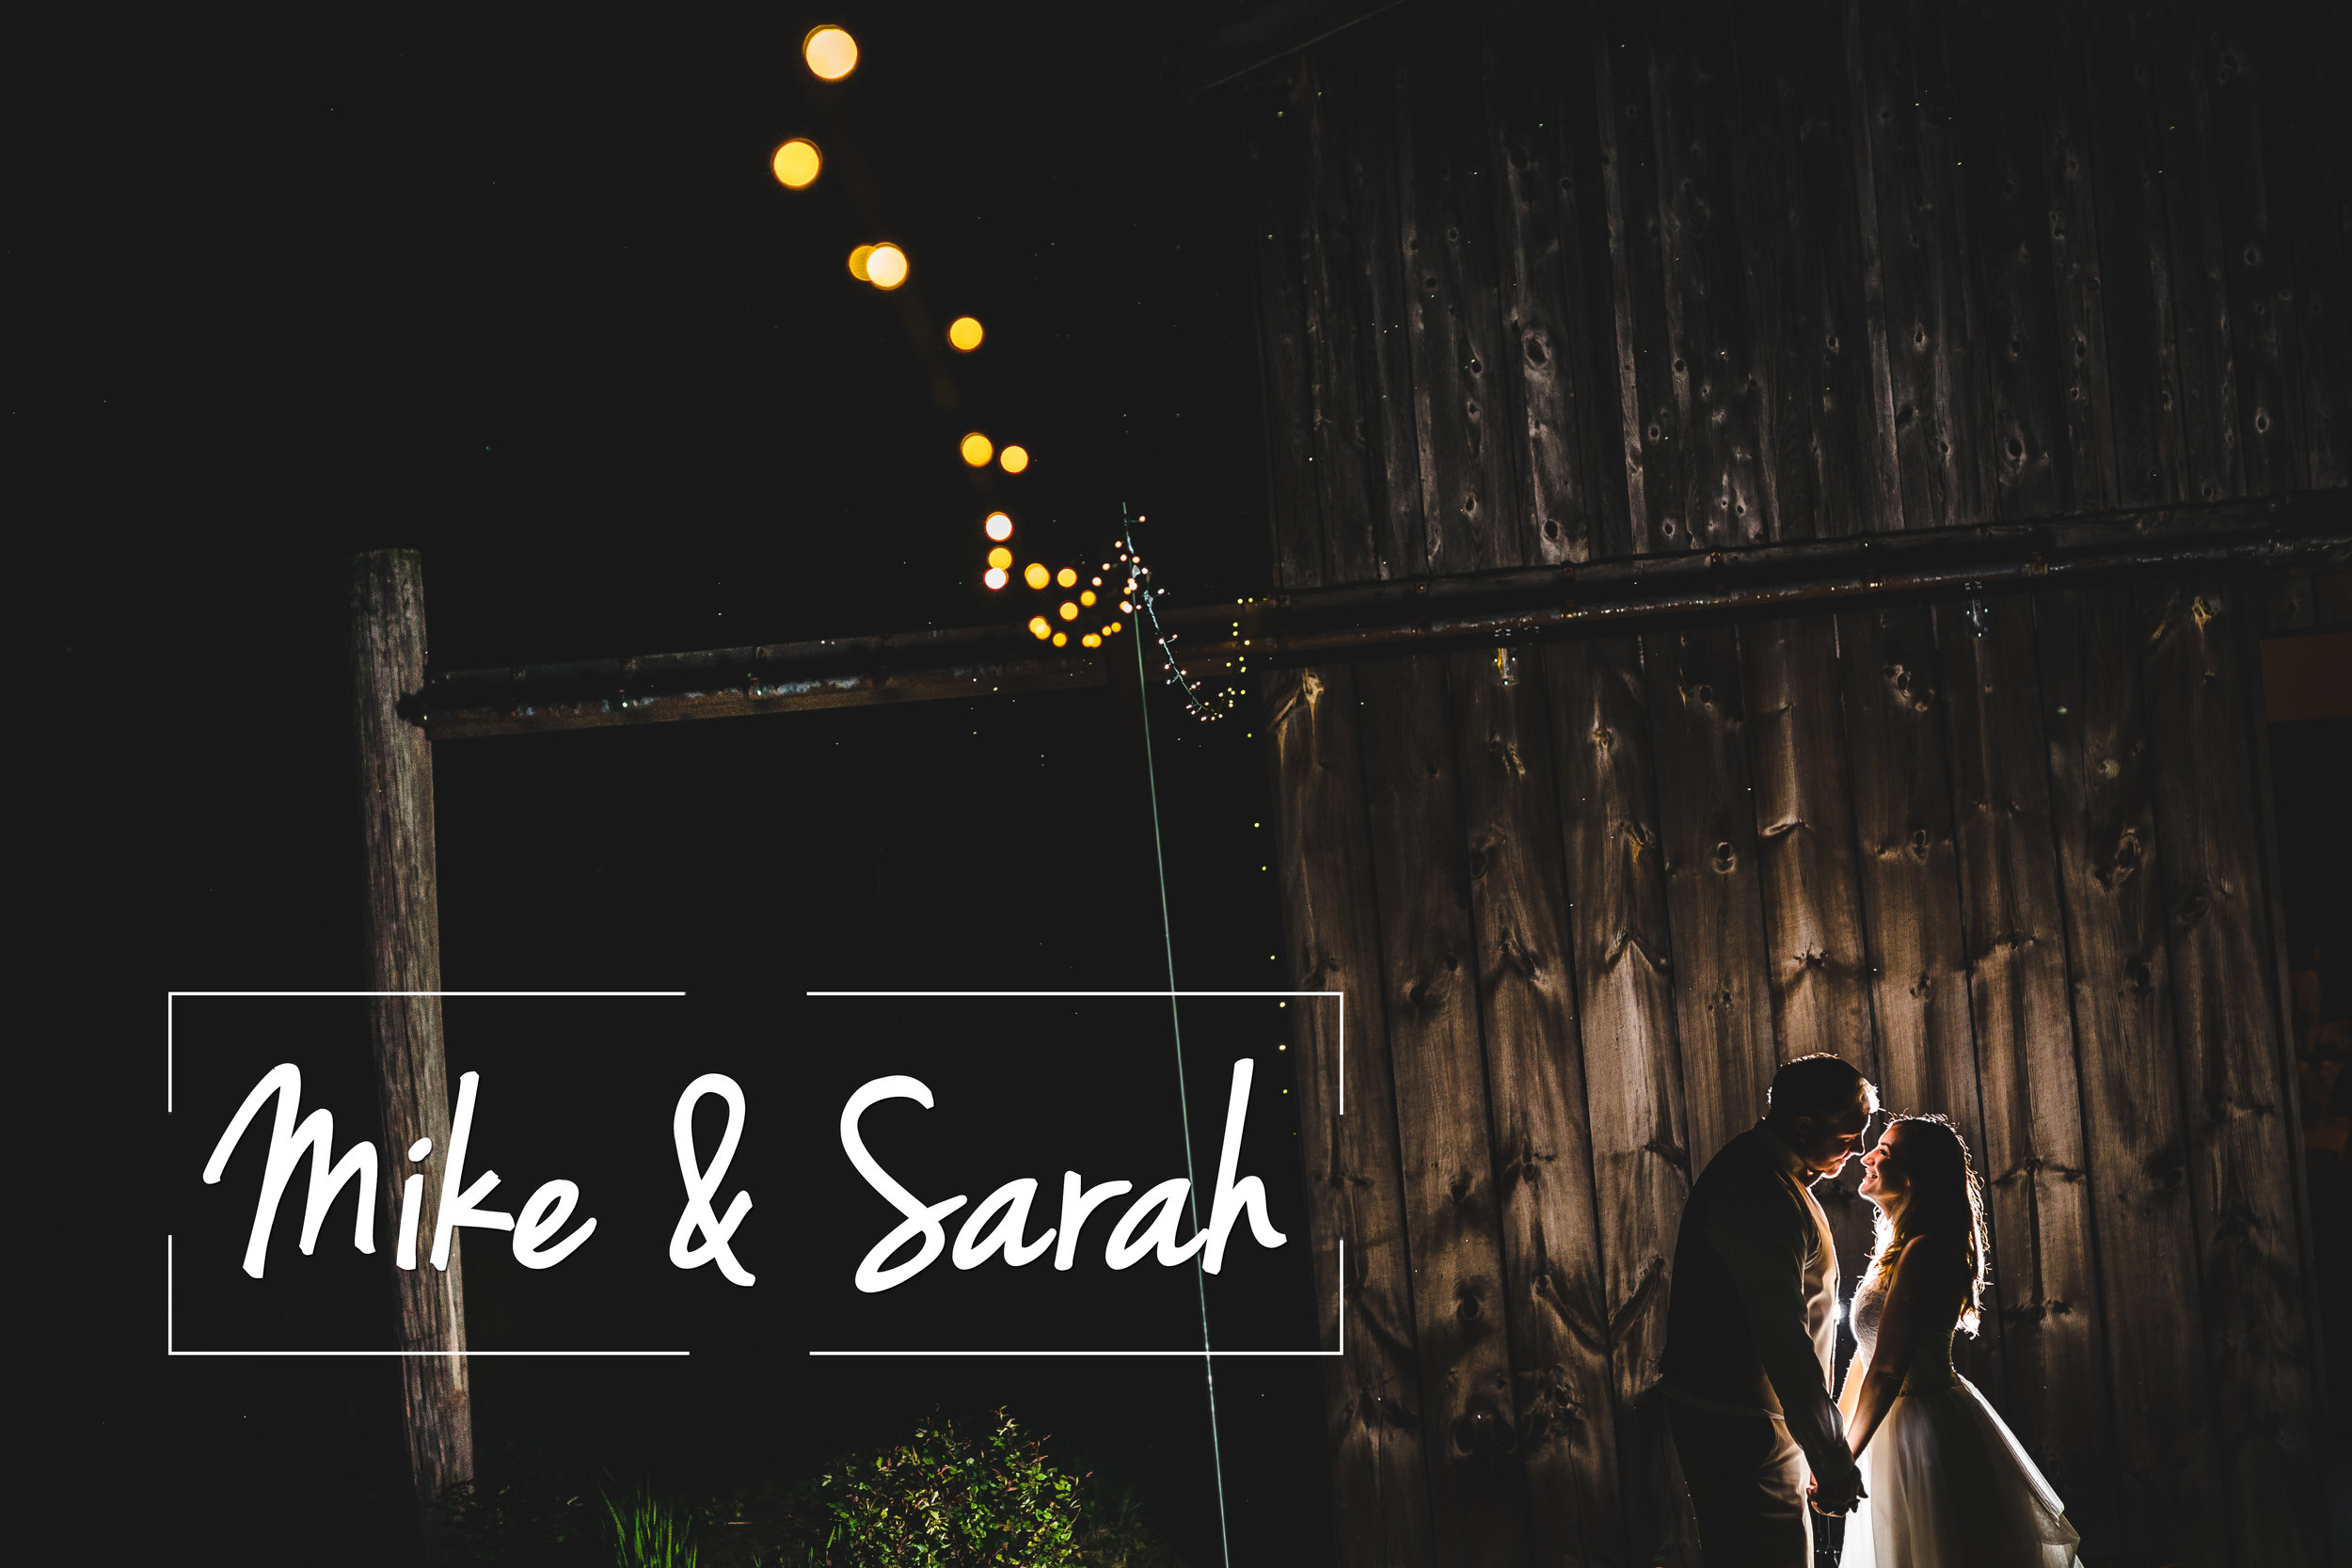 274-Mike&Sarah_party-NI5A9947 copy.jpg